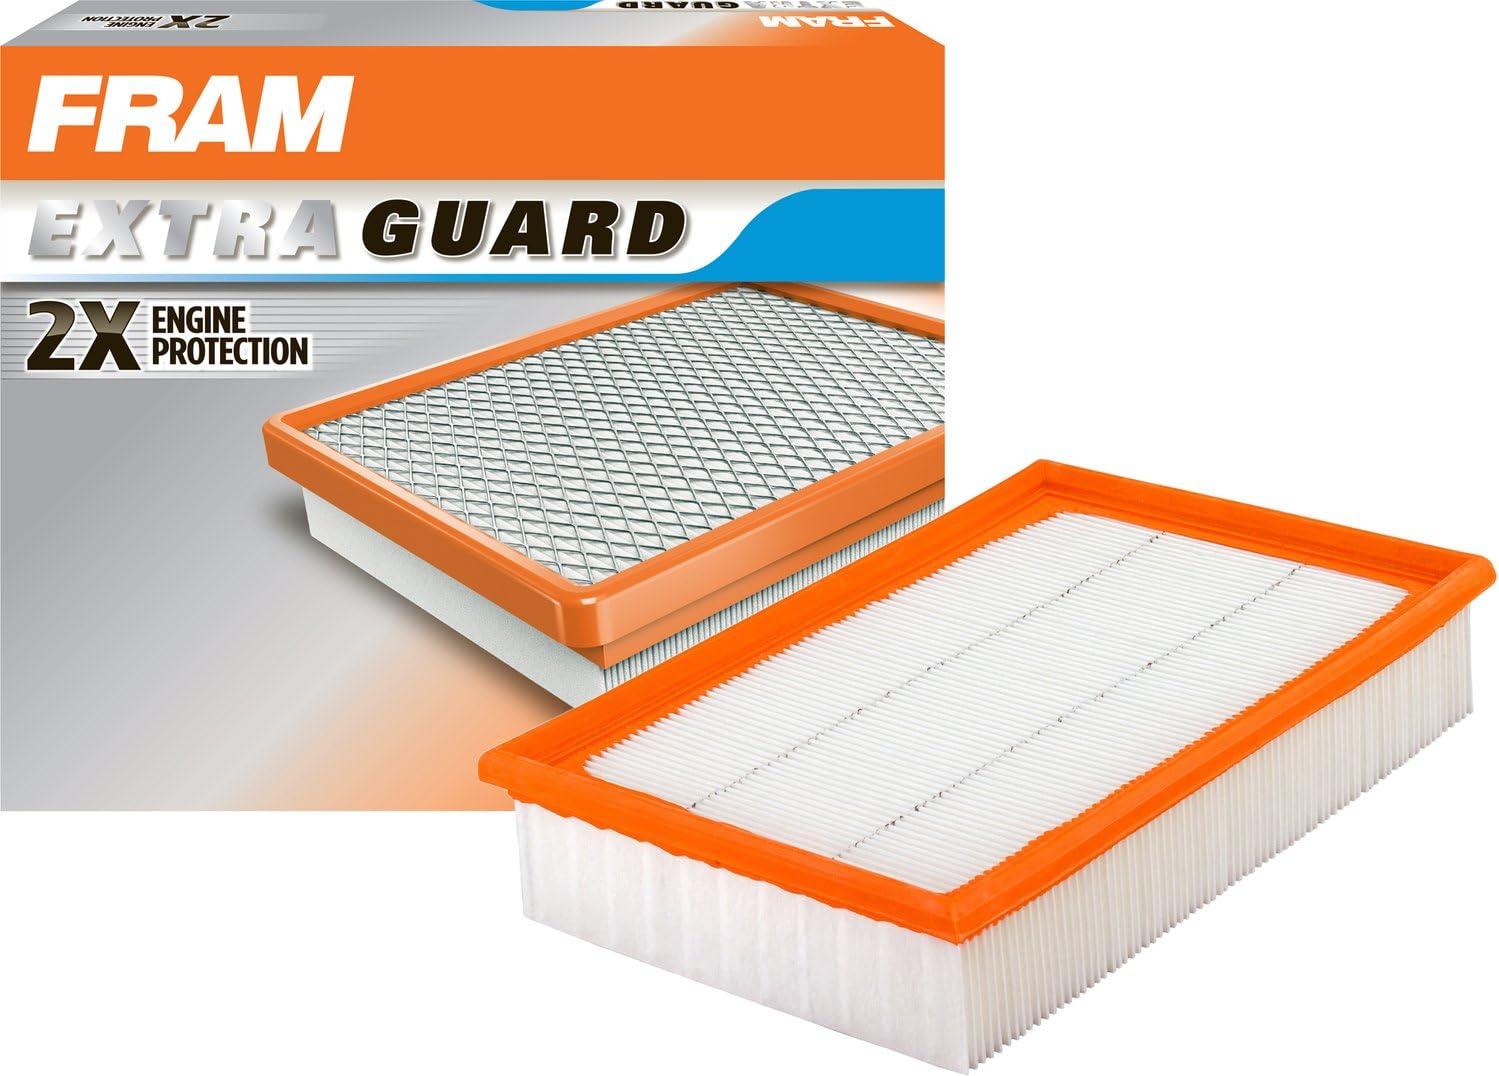 FRAM CA10432 Extra Guard Flexible Rectangular Panel Air Filter